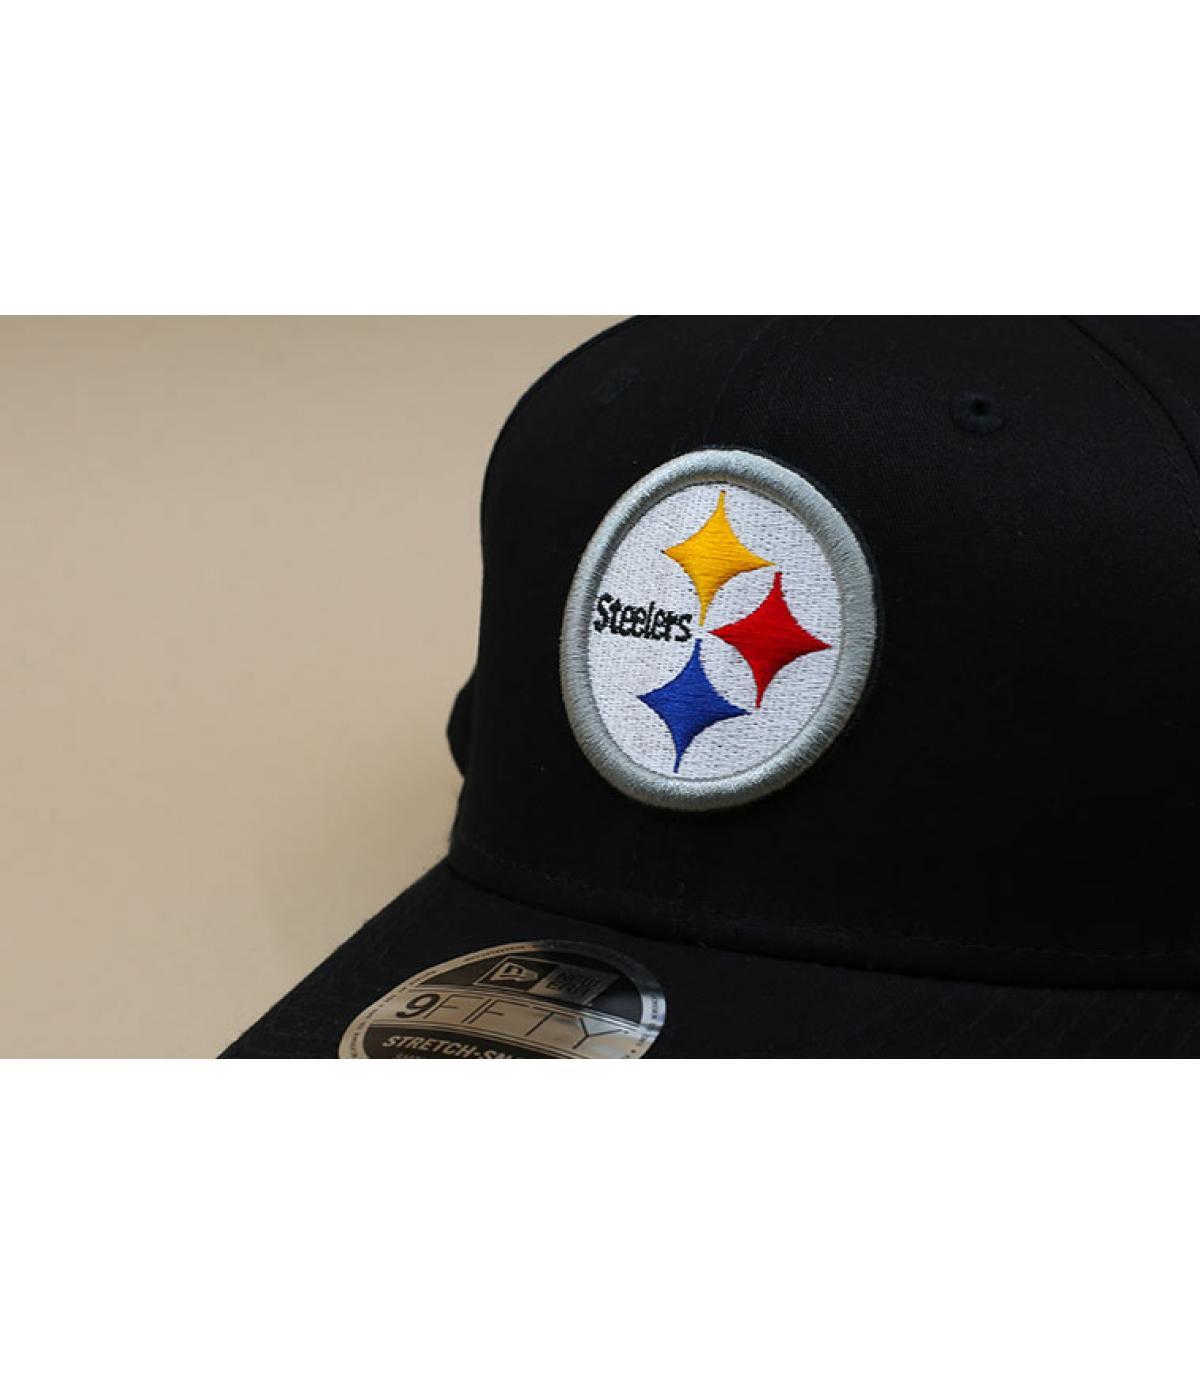 Details Team Stretch Steelers 950 - afbeeling 3